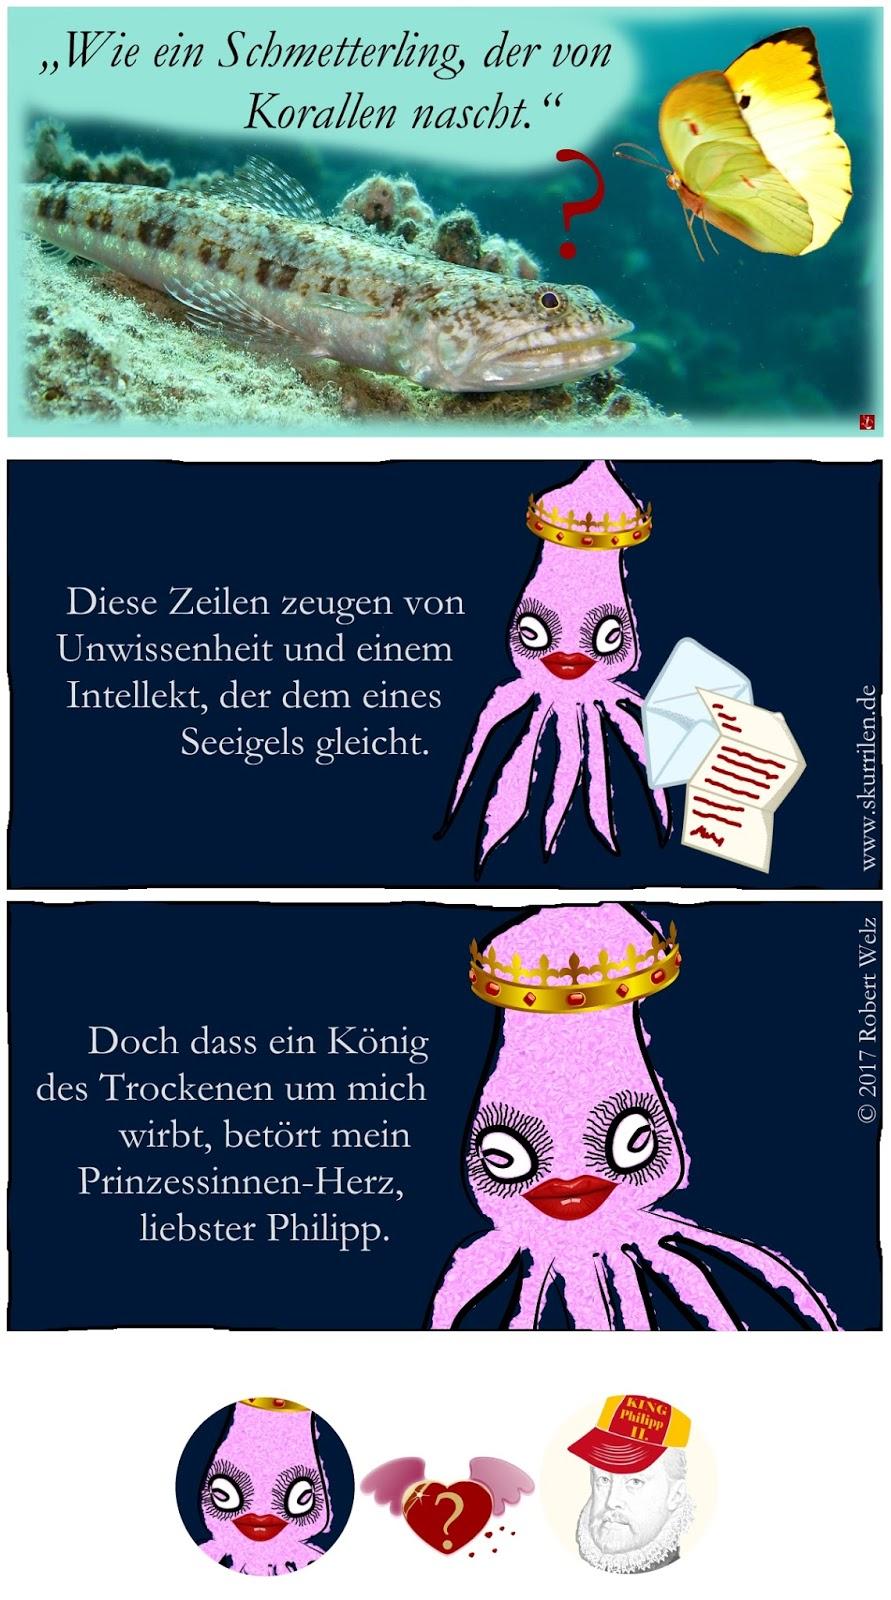 Humor Satire Comic Heirats-Diplomatie Dynastien Adelshäuser Habsburg Geschichte Prinzessin Riesenkalmare